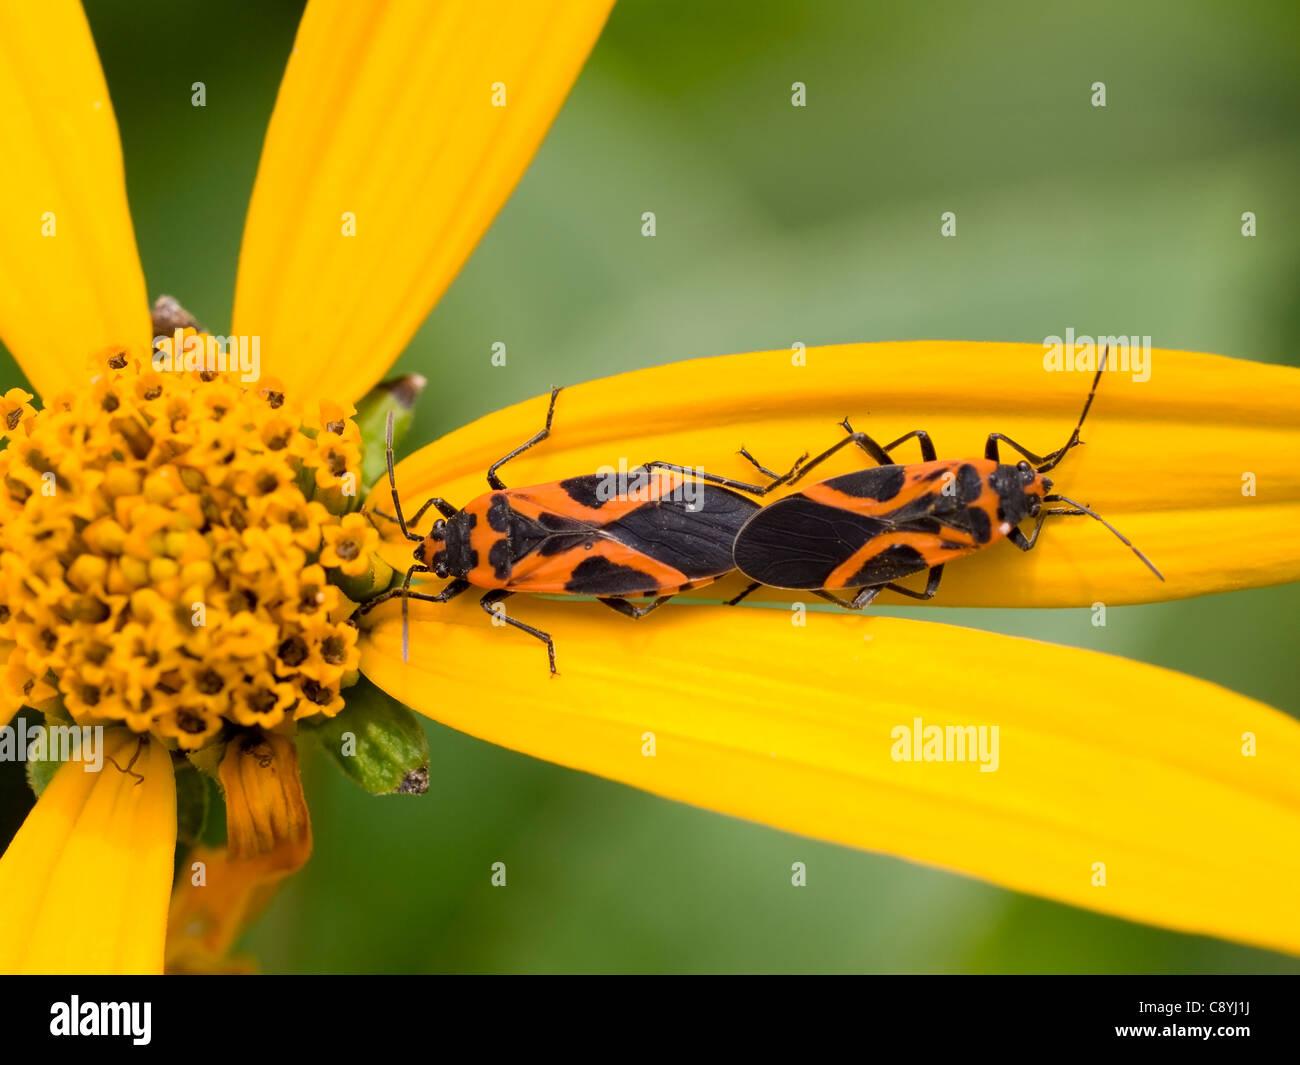 Small Eastern Milkweed Bugs (Lygaeus turcicus) mating on Jerusalem Artichoke (Helianthus tuberosus) Stock Photo